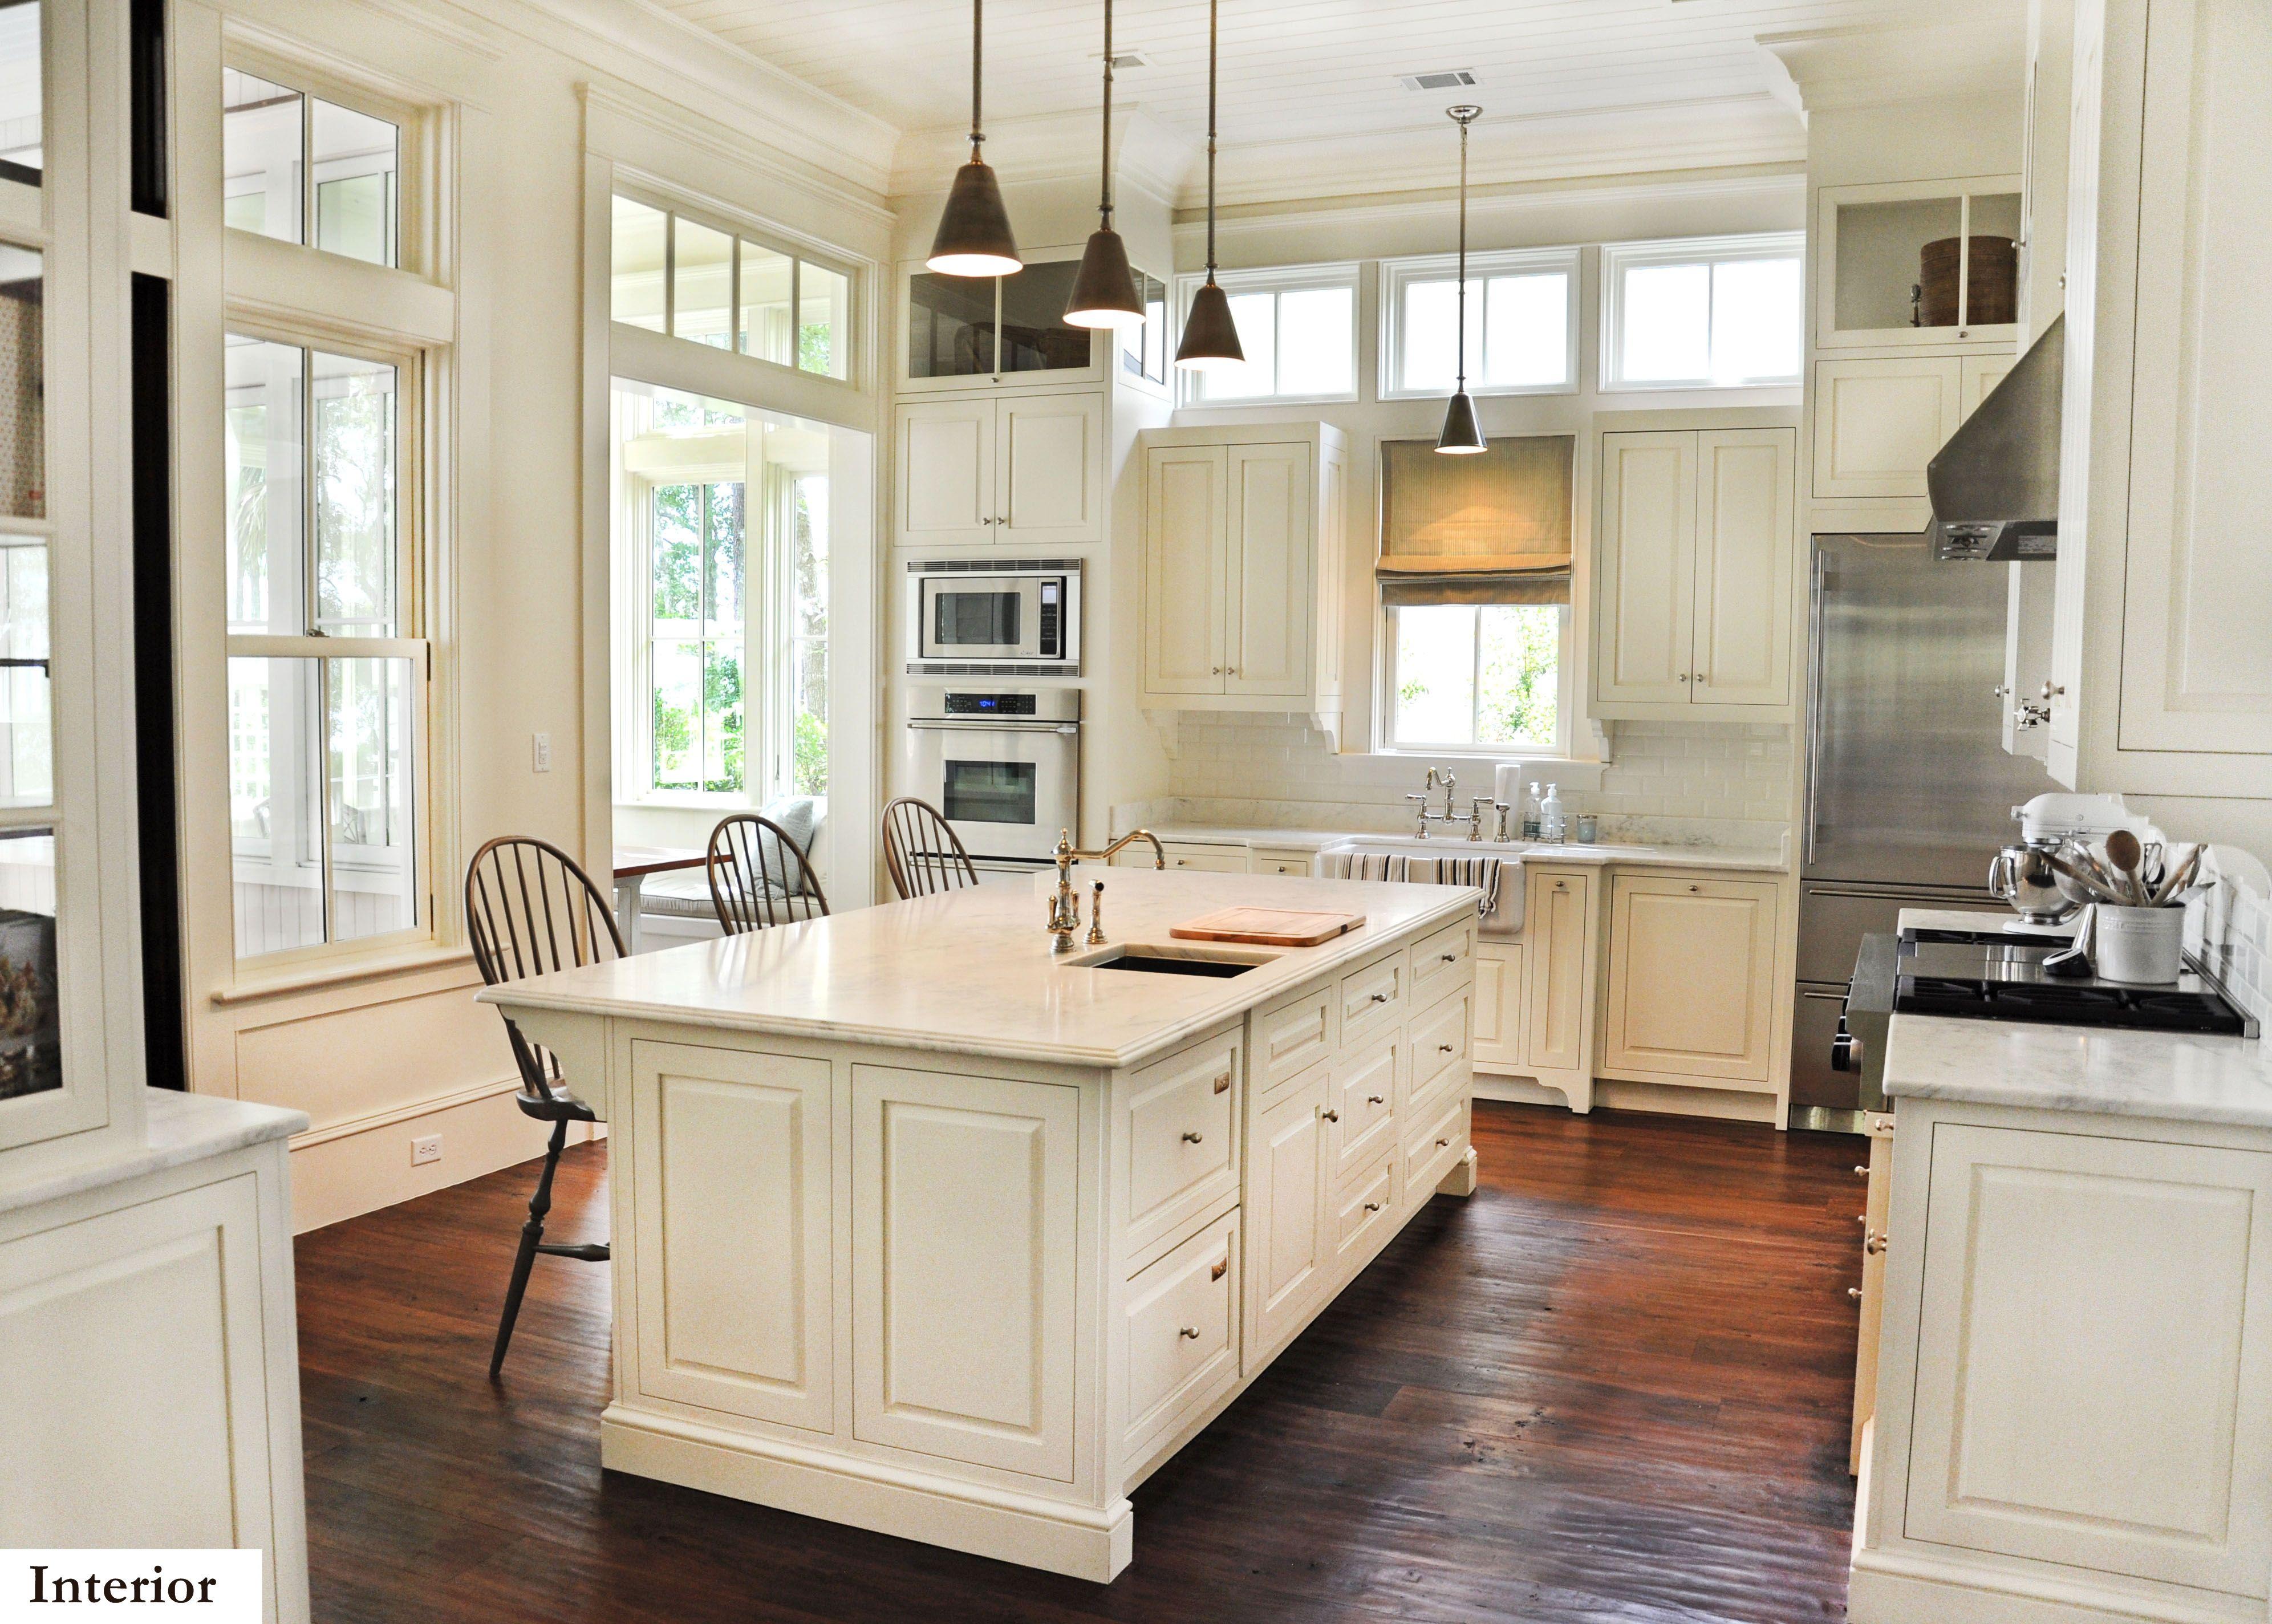 Nahb Hurley Santos Residence Palmetto Bluff Kitchen Style Kitchen Design Above Kitchen Cabinets